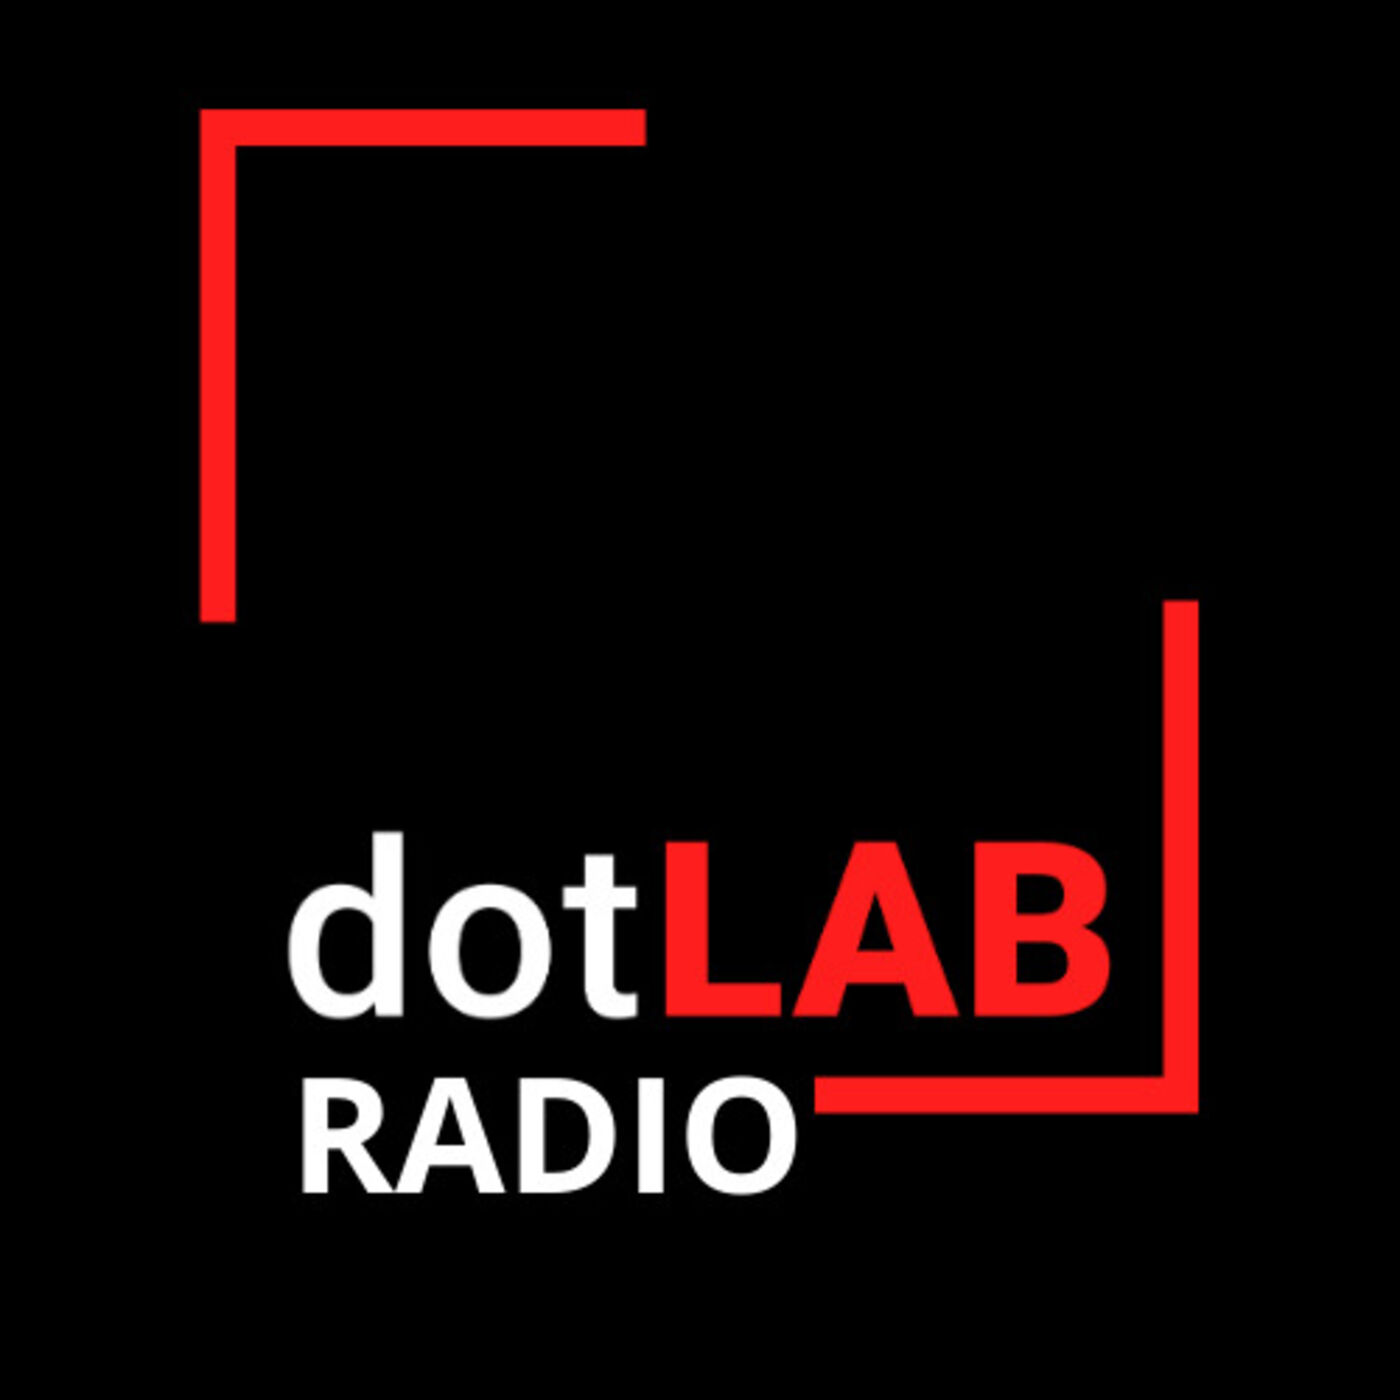 dotLAB Radio